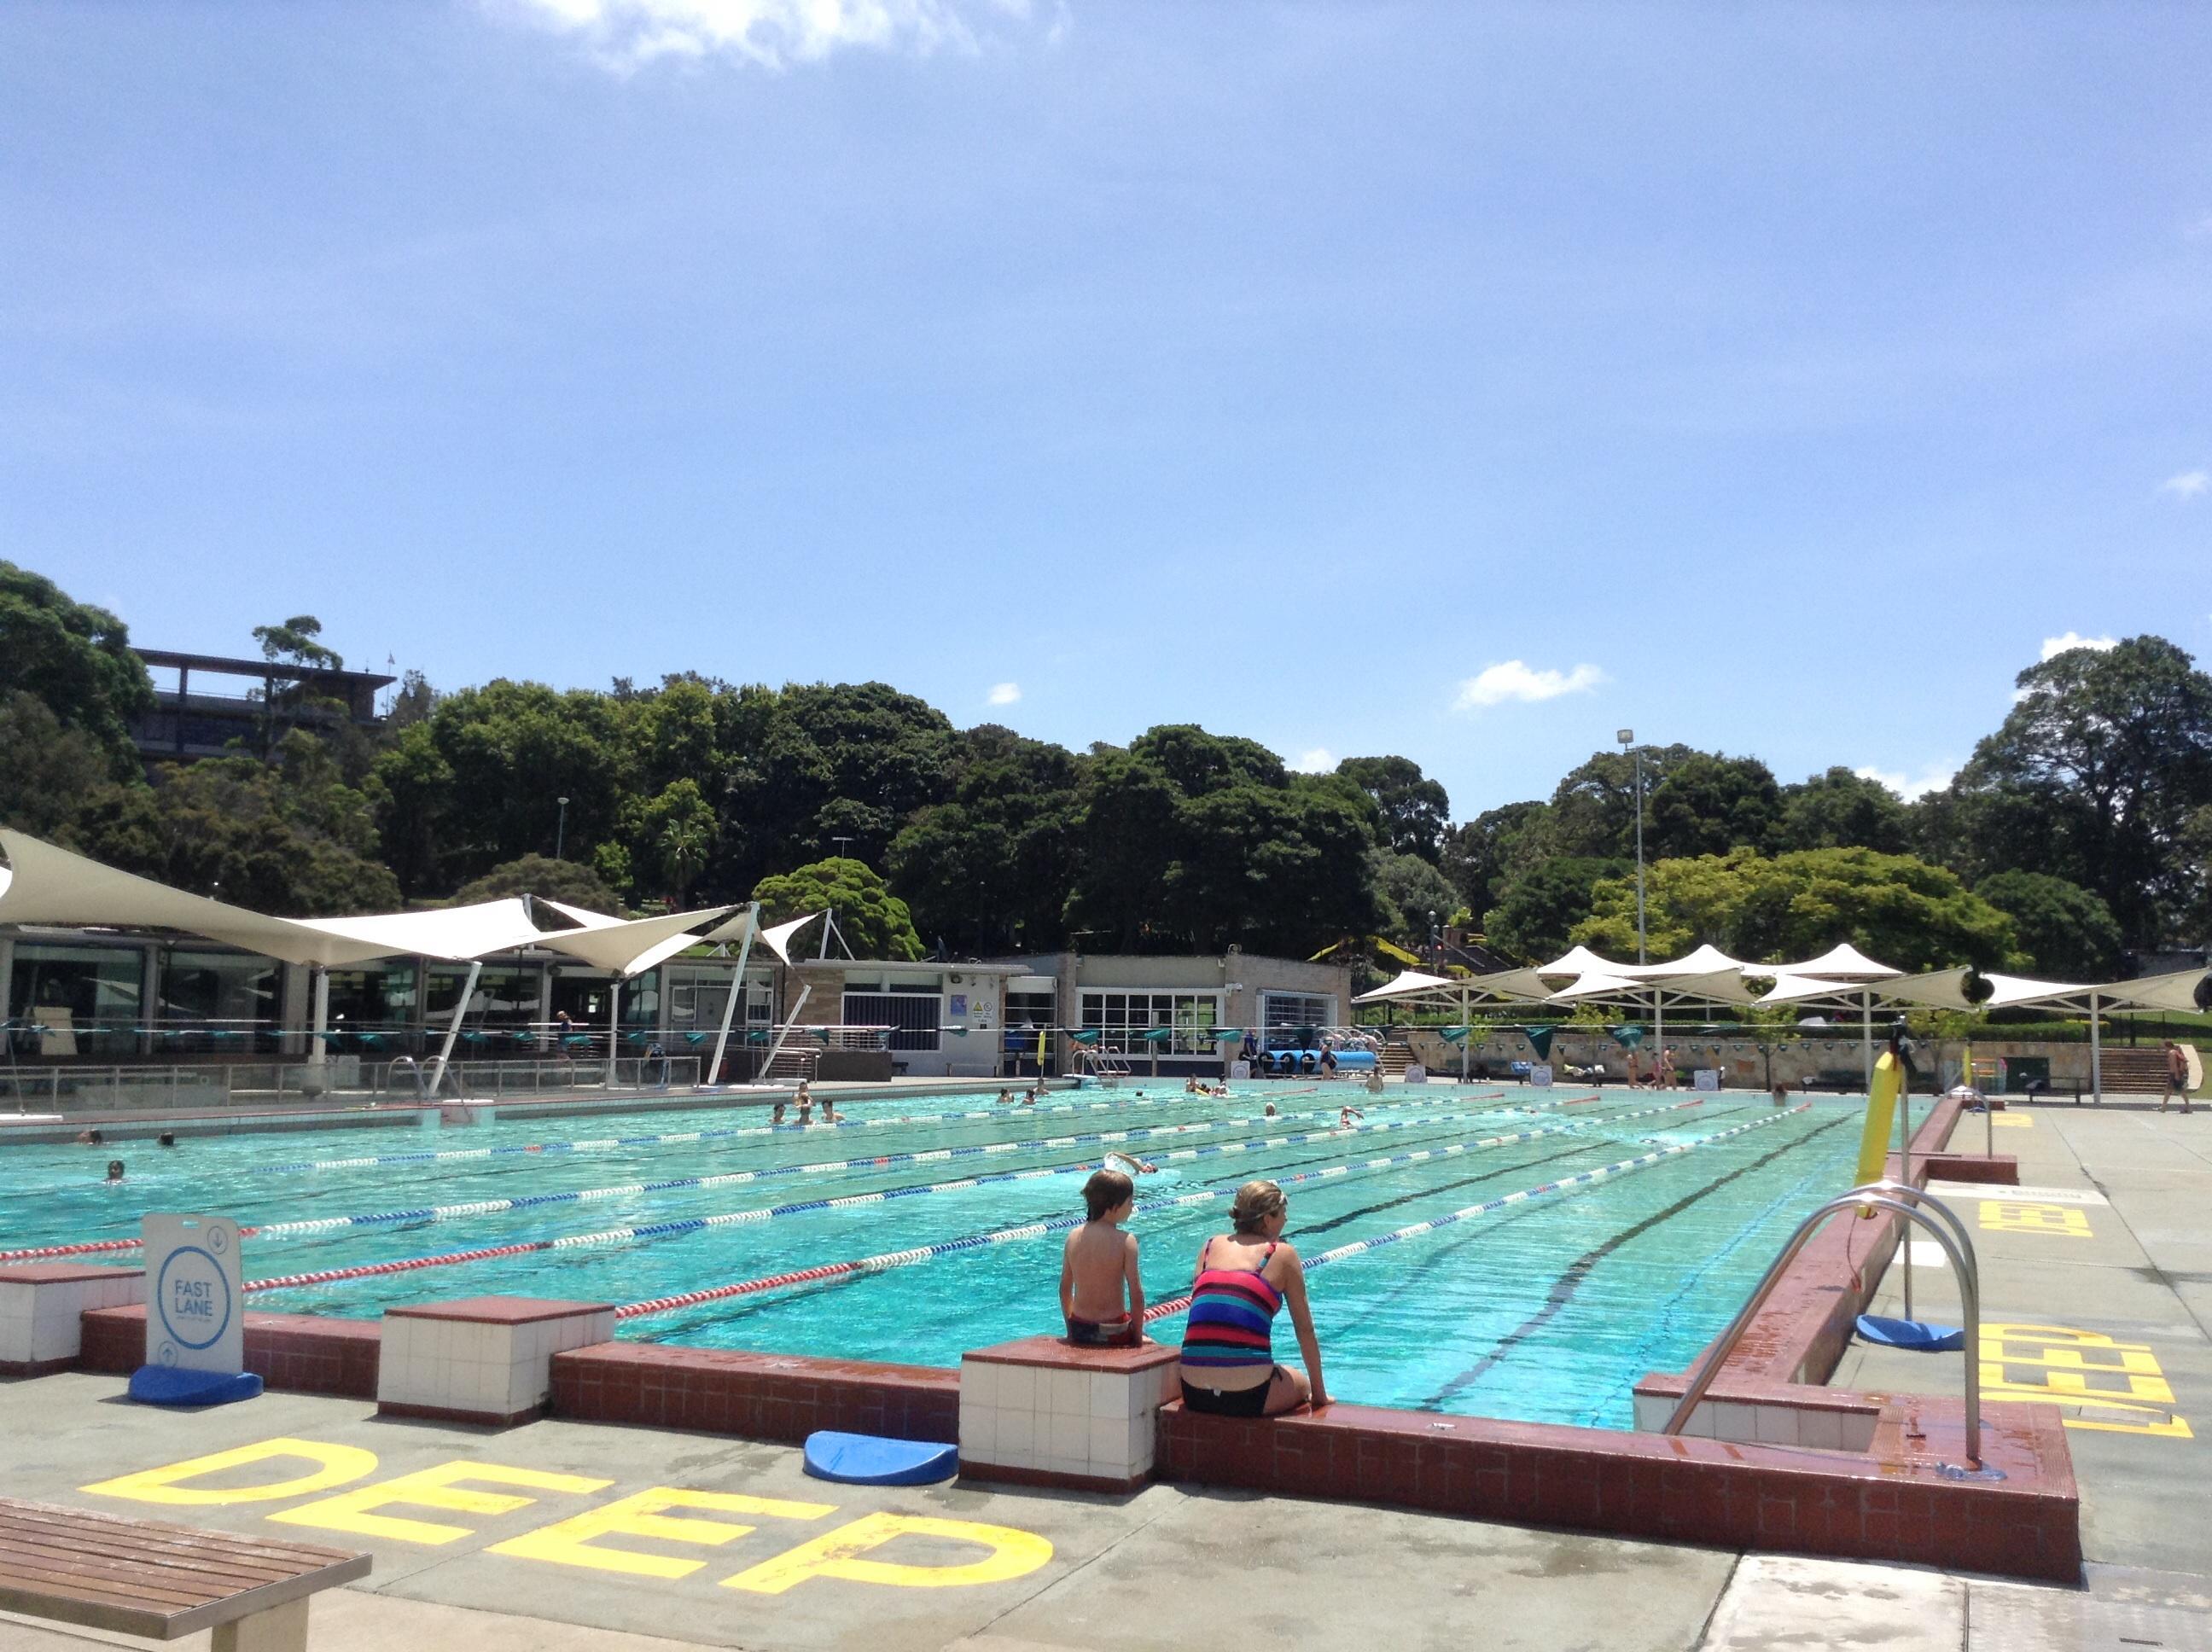 30 victoria park swimming pool sydney decor23 for Pool show 2015 sydney